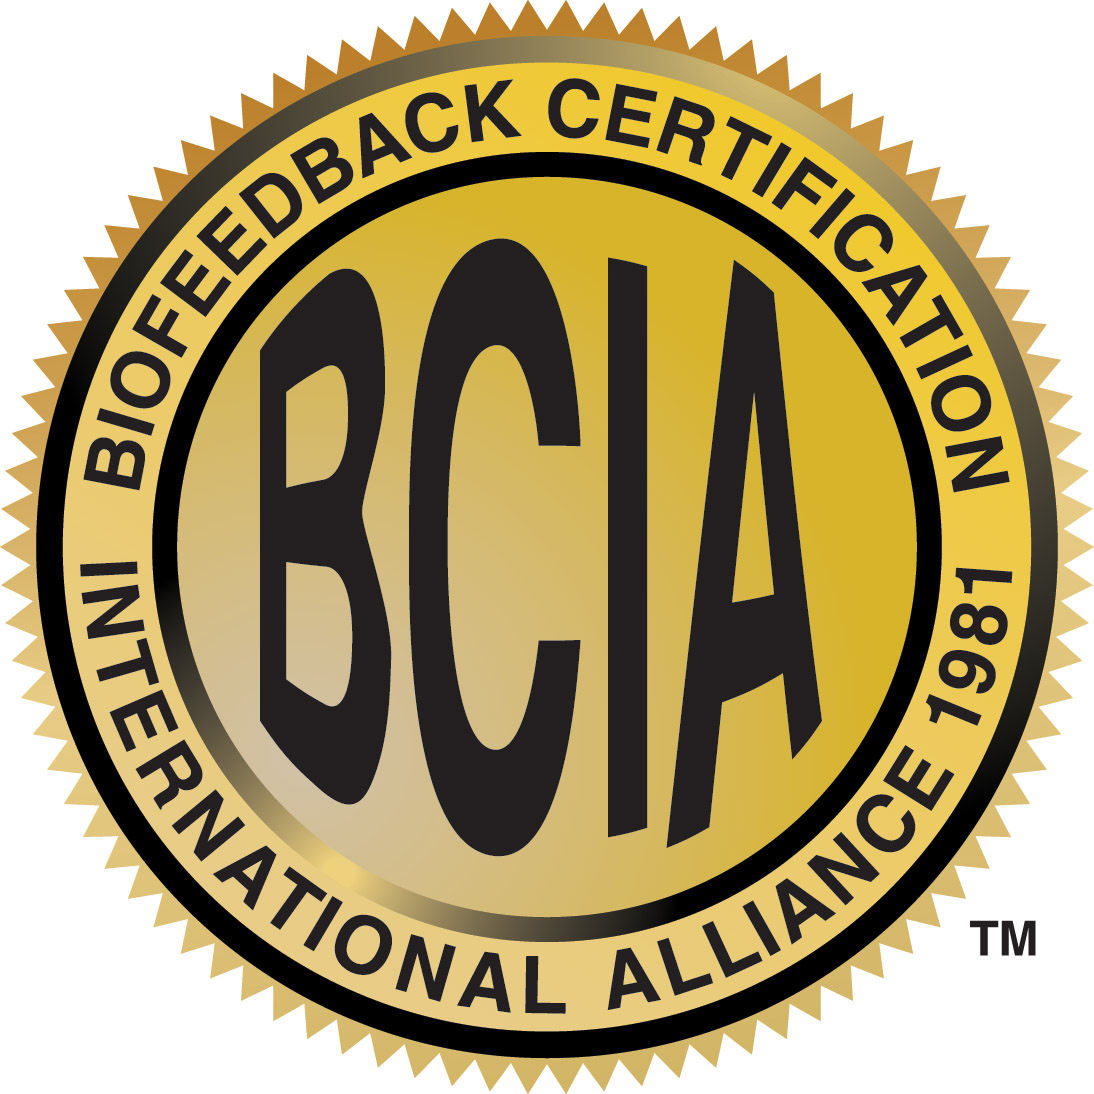 BCIA hi res logo.jpg